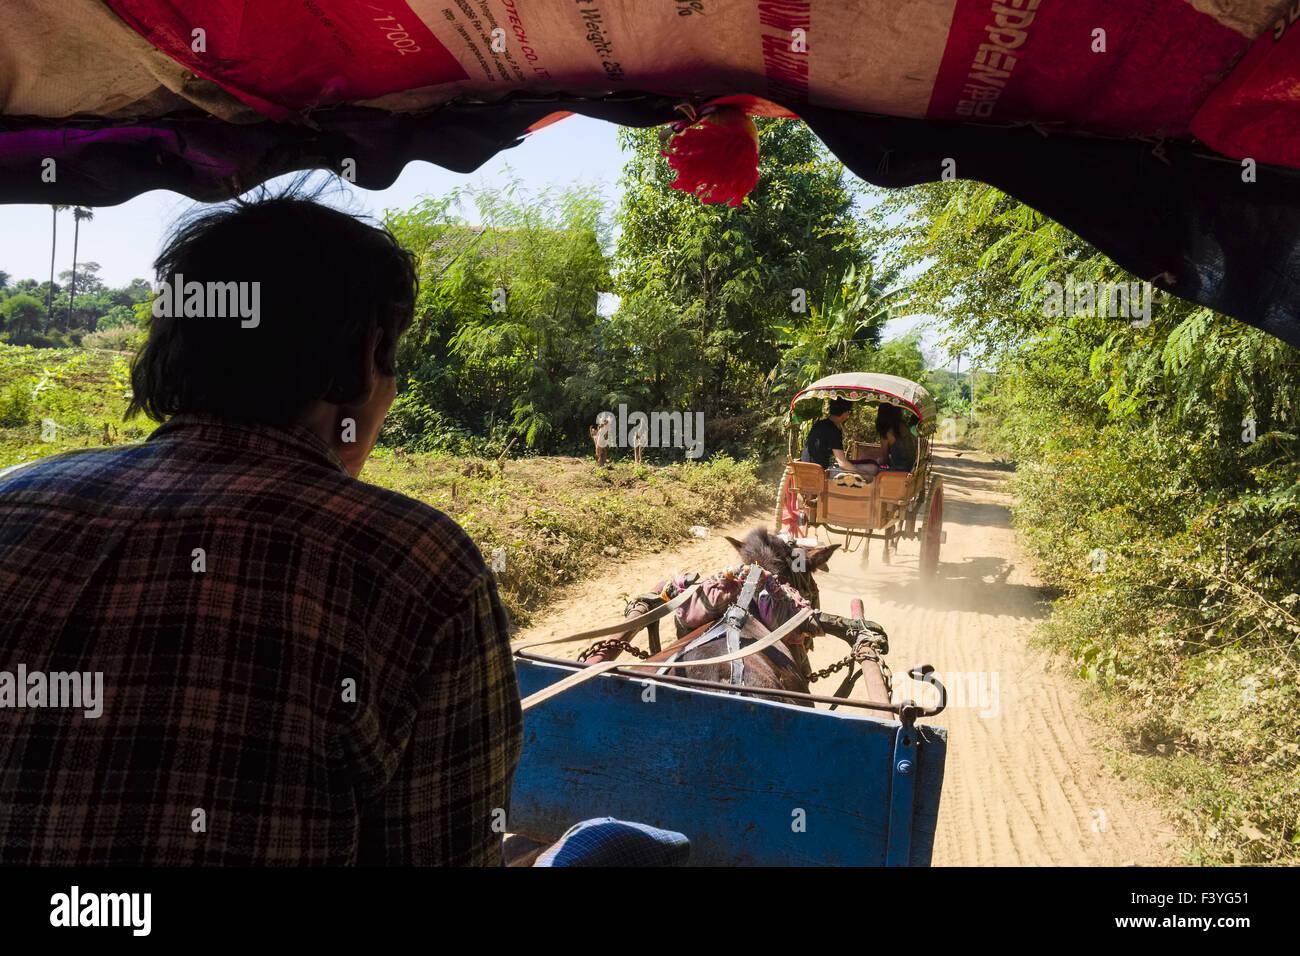 Horse-drawn carriages, Inwa, Myanmar, Asien - Stock Image